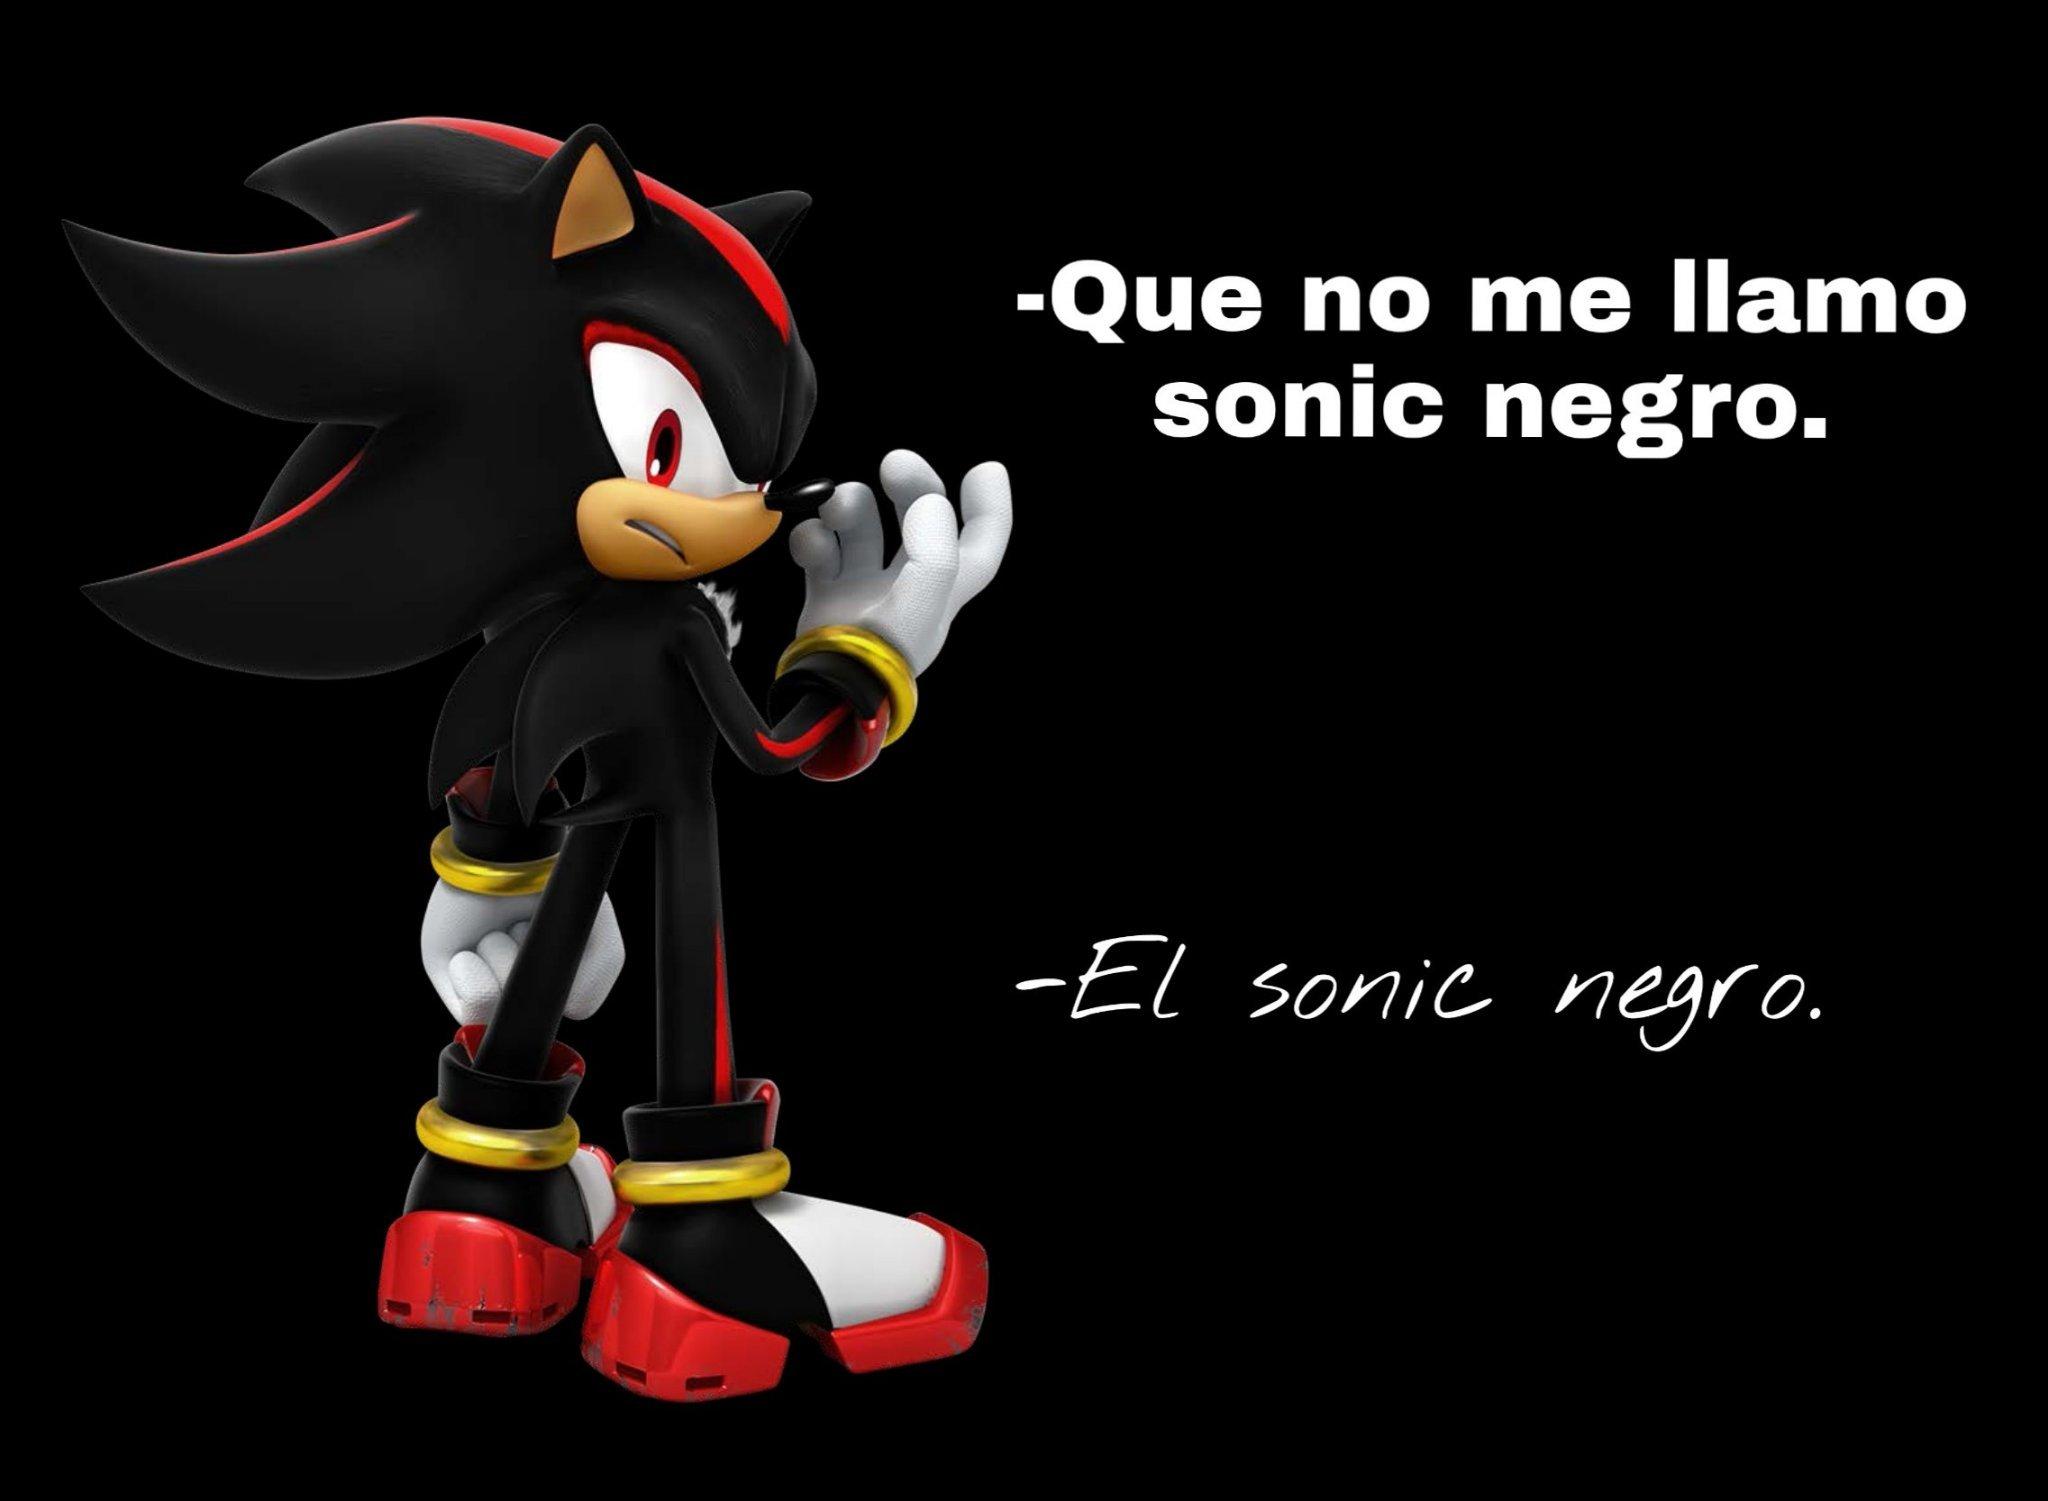 sonic negro - meme